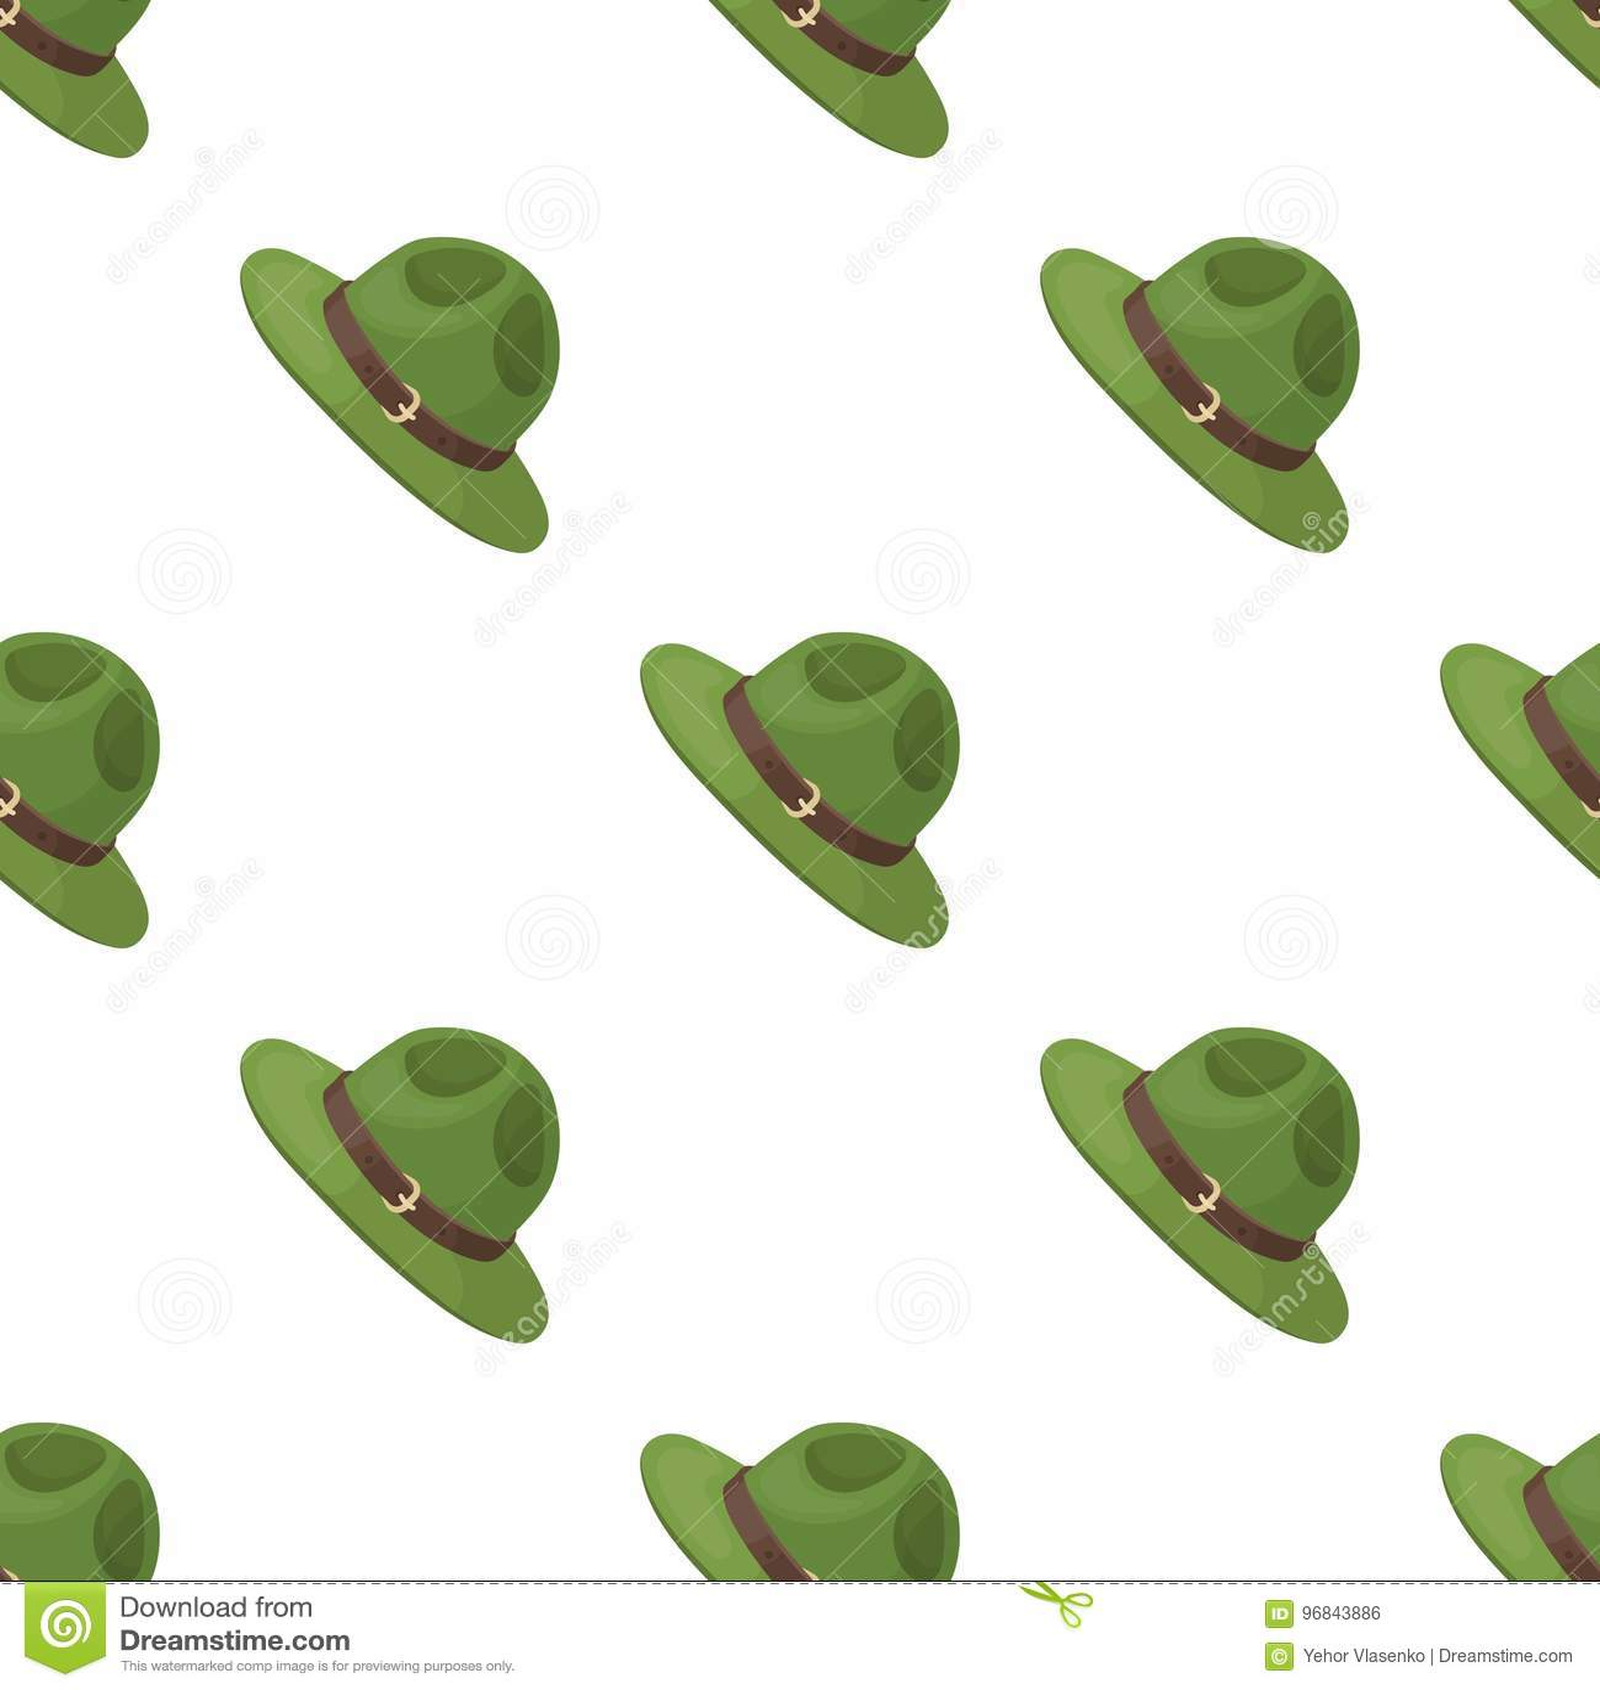 Green hat of a canadian ranger canada single icon in cartoon green hat of a canadian ranger canada single icon in cartoon style vector symbol stock illustration web biocorpaavc Choice Image